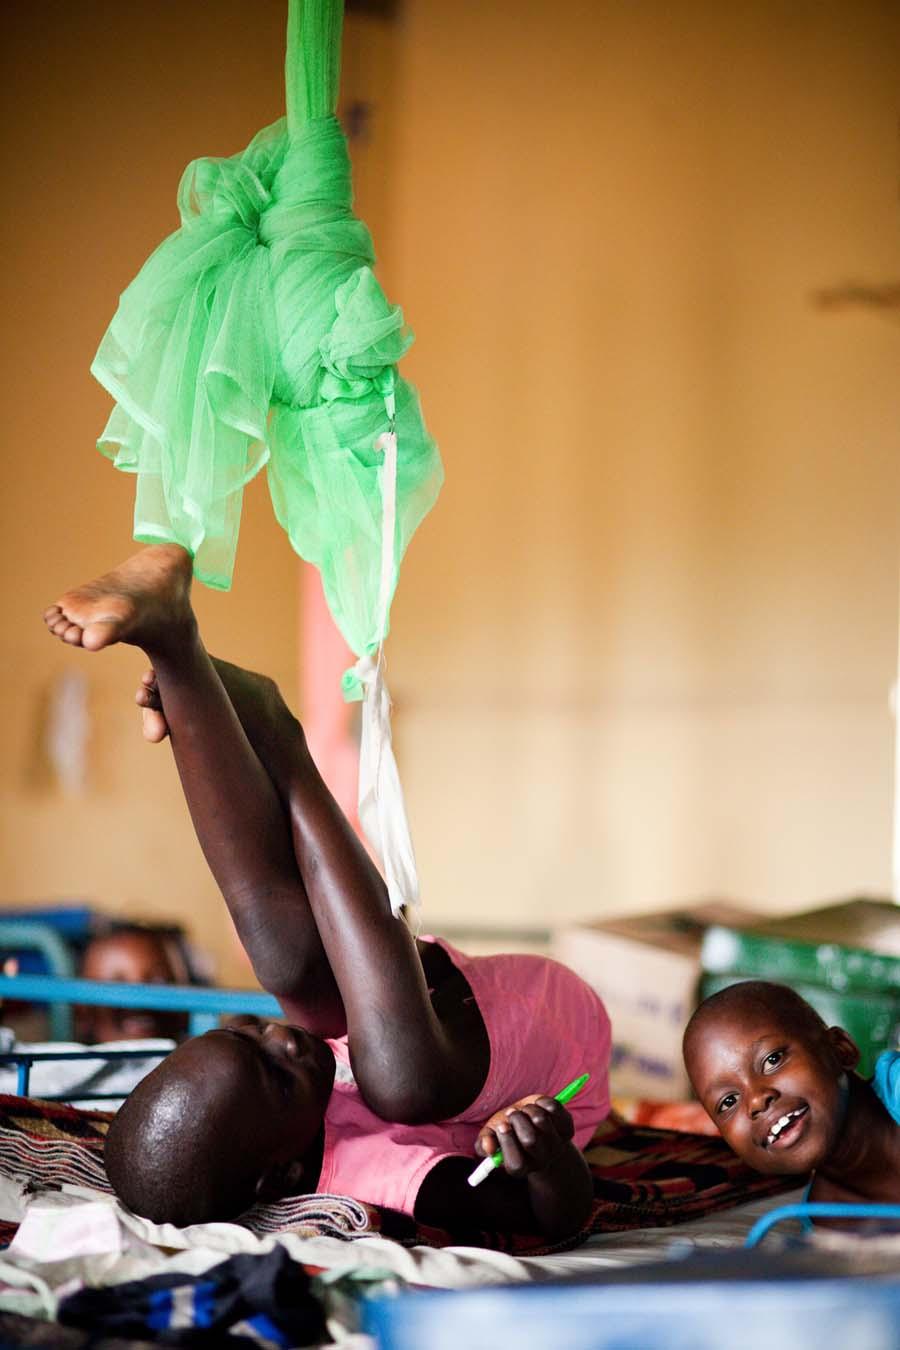 jessicadavisphotography.com | Jessica Davis Photography | Portrait Work in Uganda| Travel Photographer | World Event Photographs 7 (7).jpg